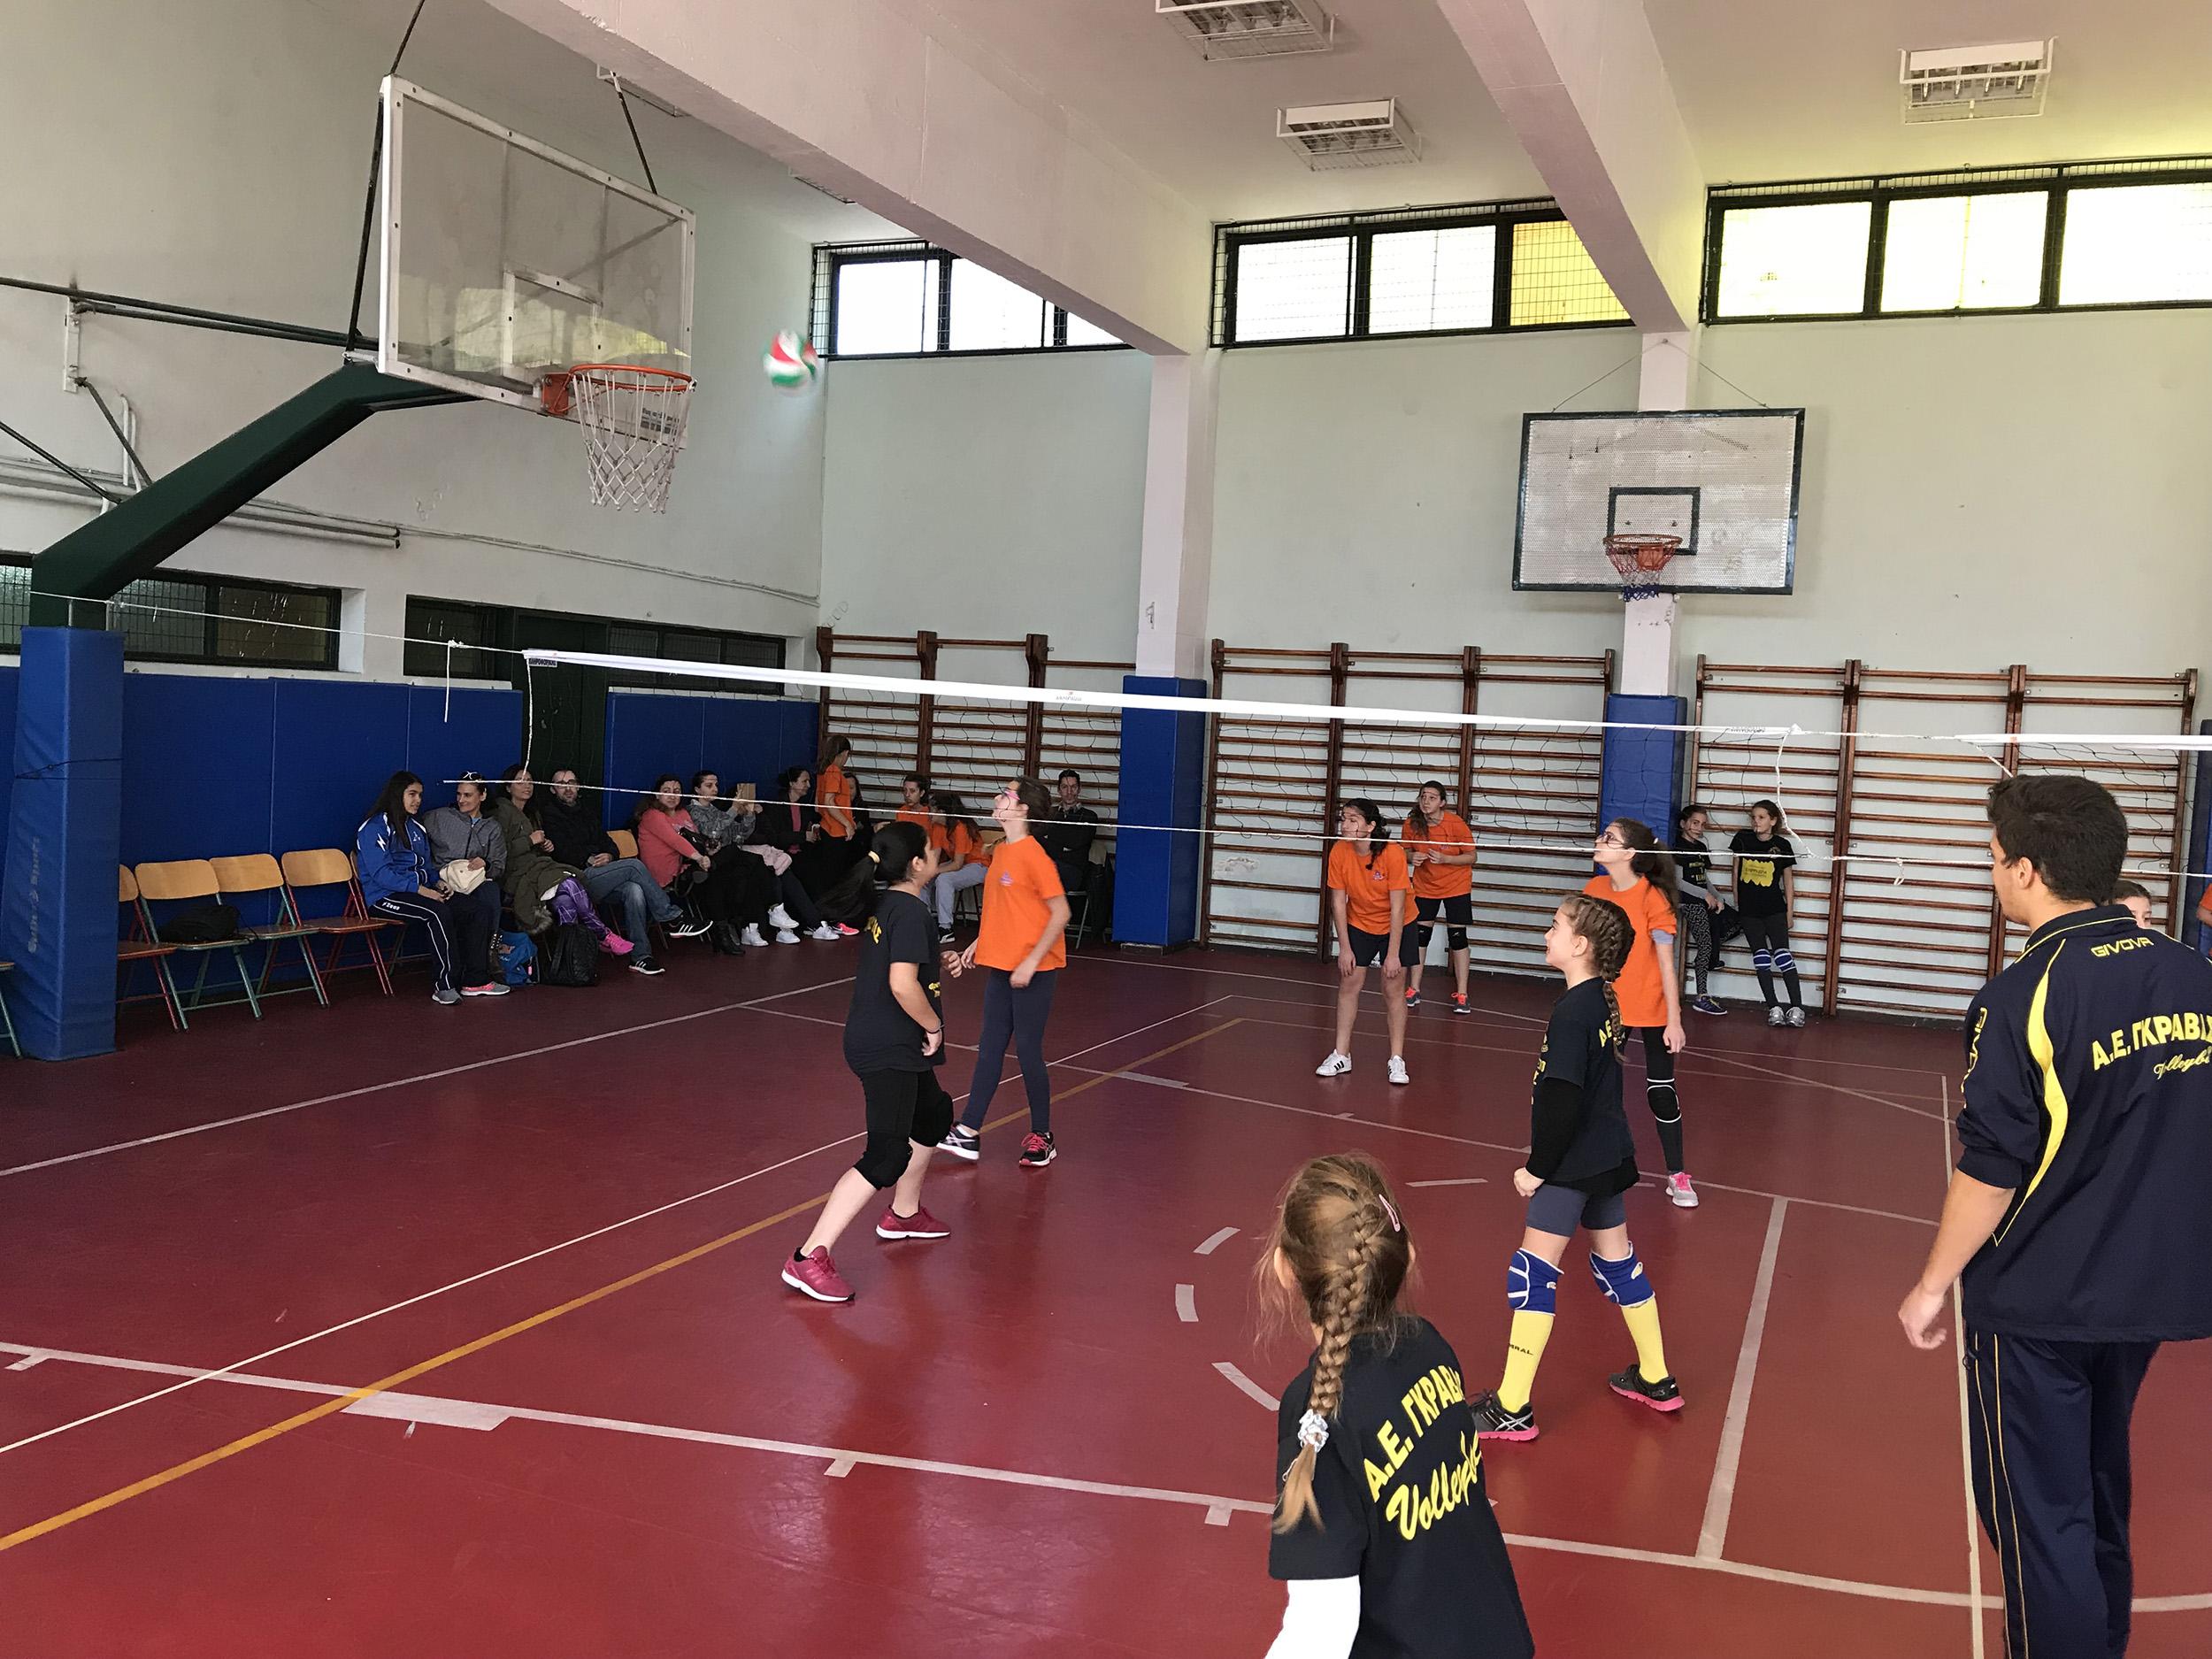 Volley – Φιλικός Αγώνας με Α.Ε. Γκράβας